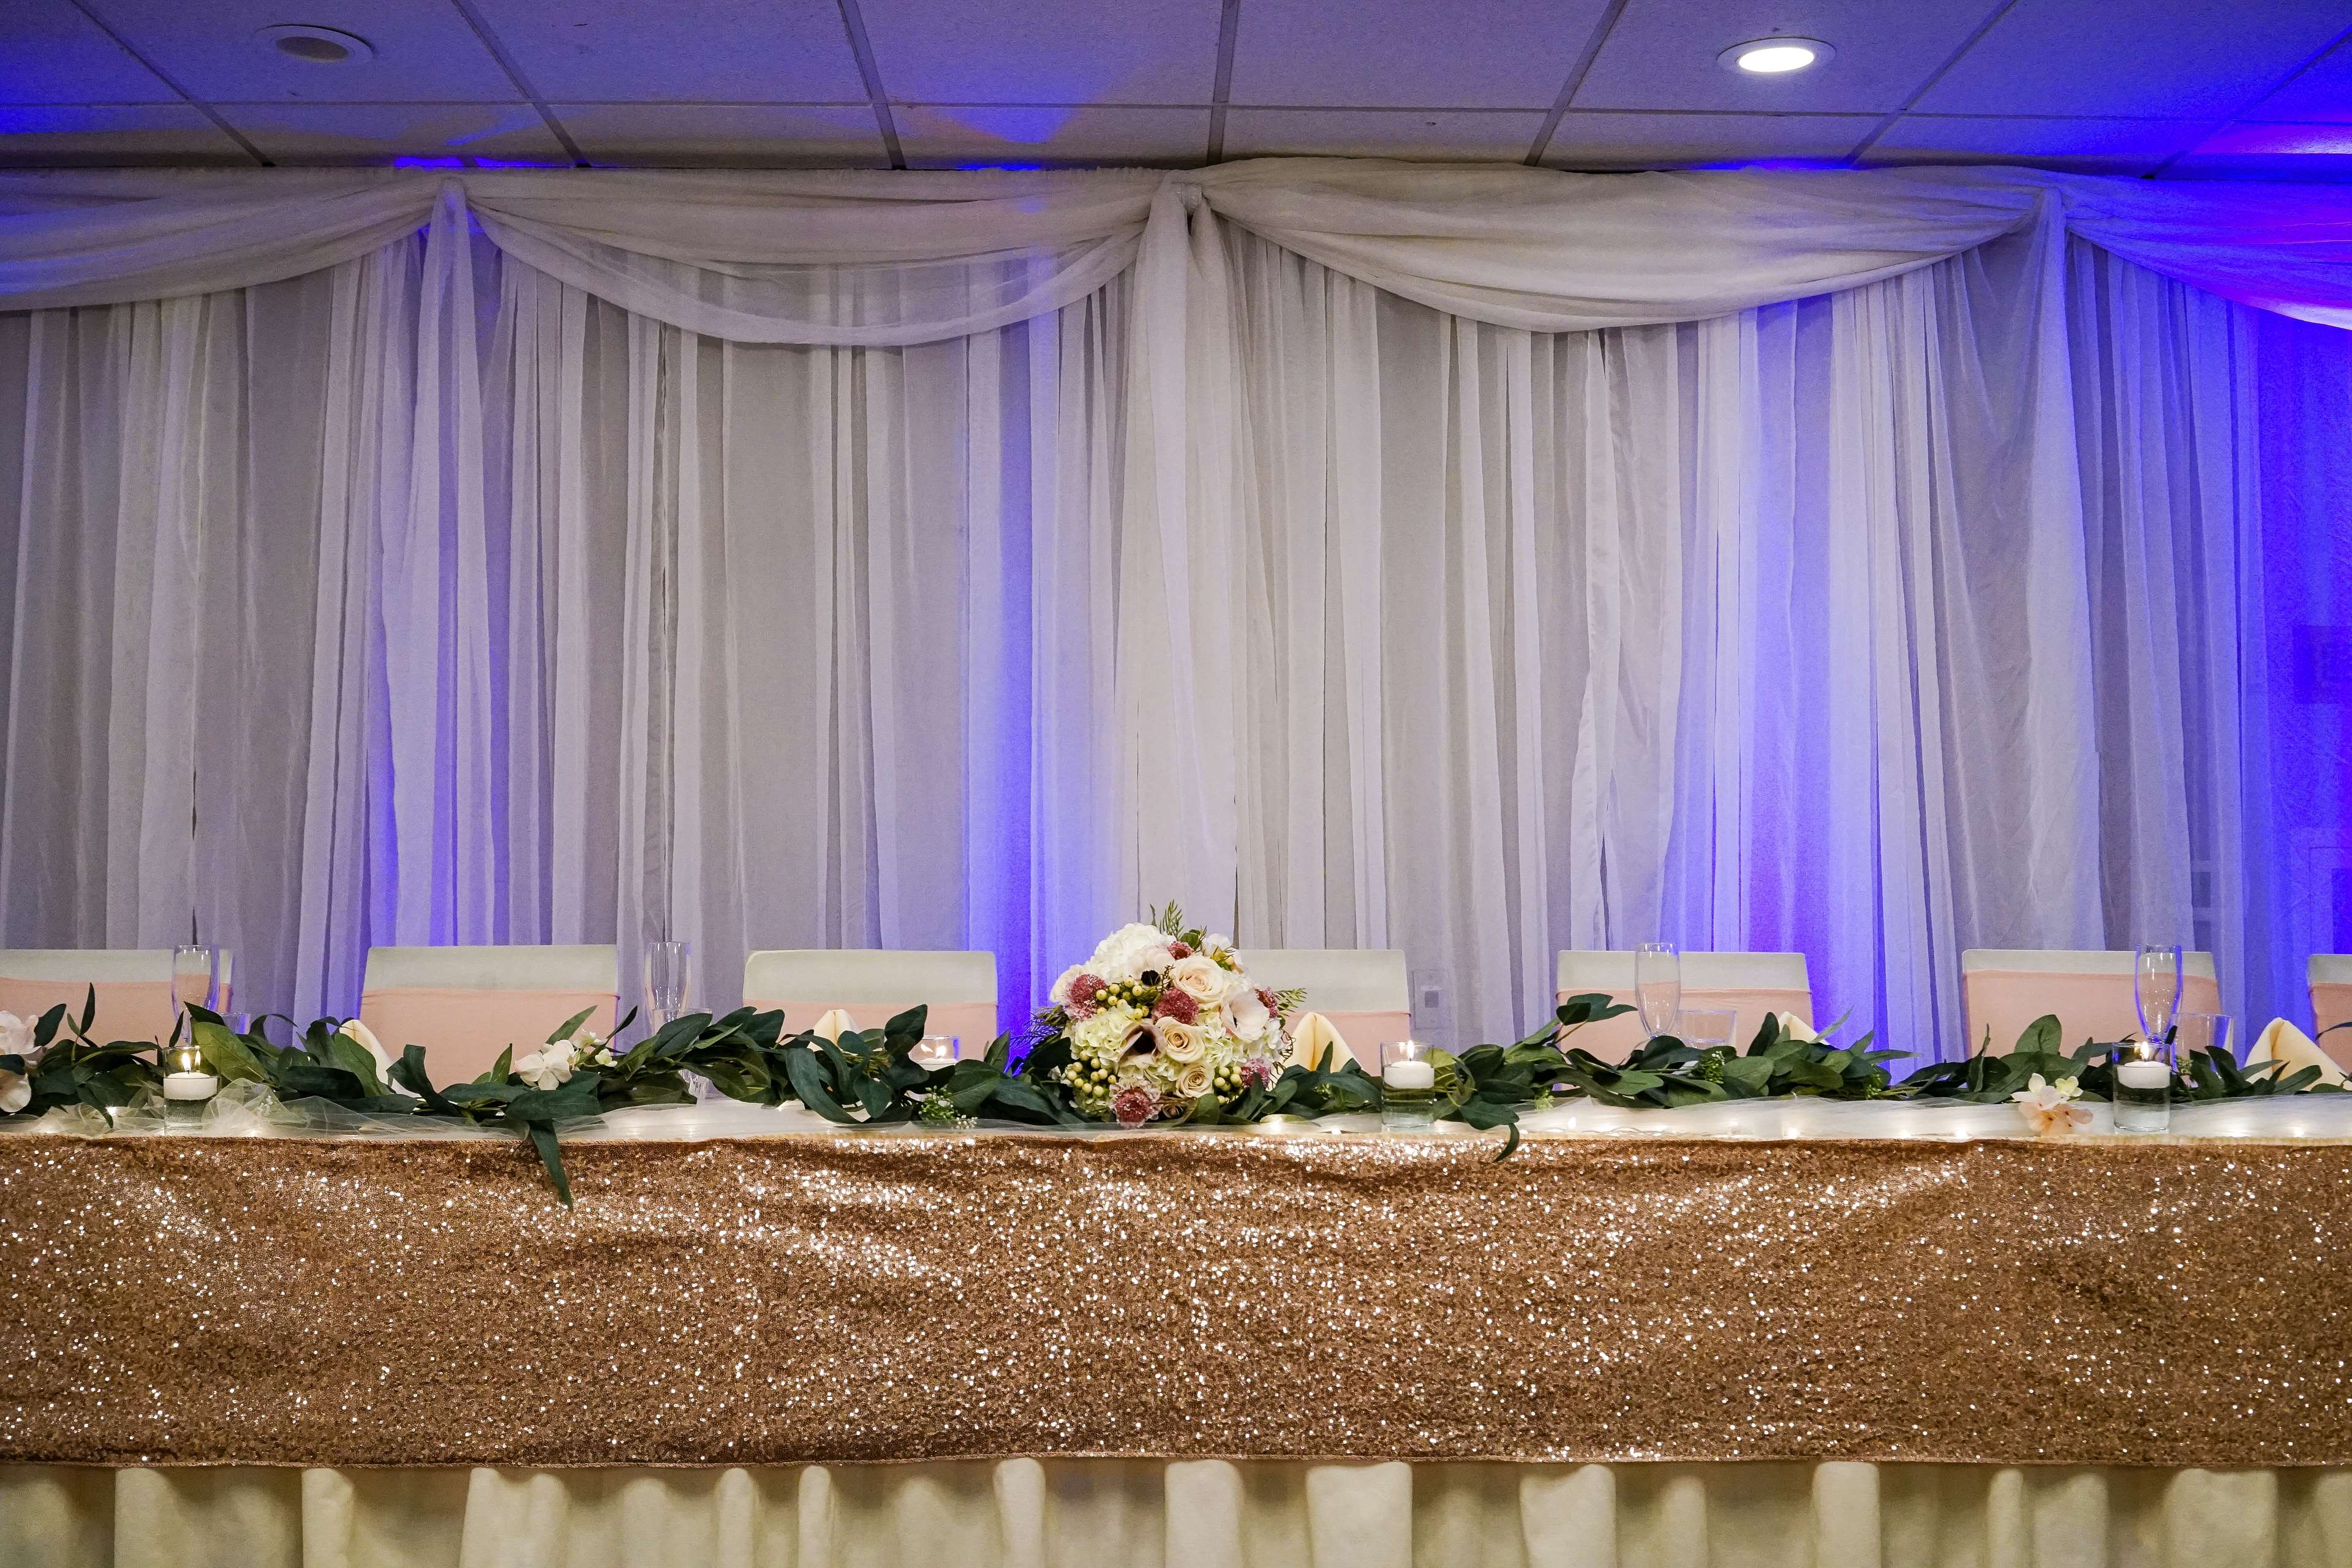 Best Western Plus Dubuque Hotel Amp Conference Center 3100 Dodge St Dubuque Ia 52003 Yp Com